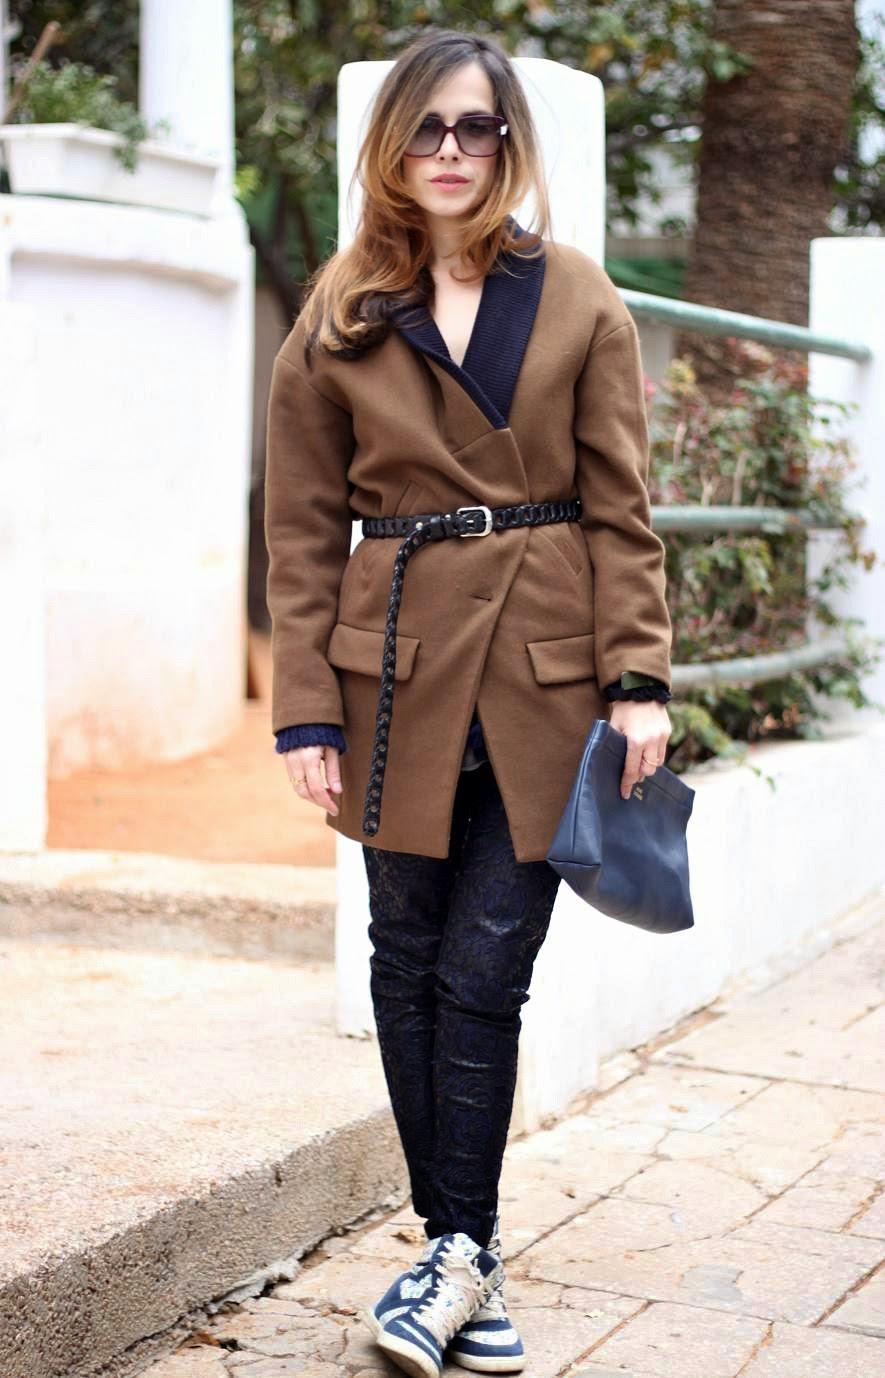 telavivfashion, inspiration, pairing, beltandcoat, fashionblog, בלוגאופנה, אופנה, acnestudio, hermes,